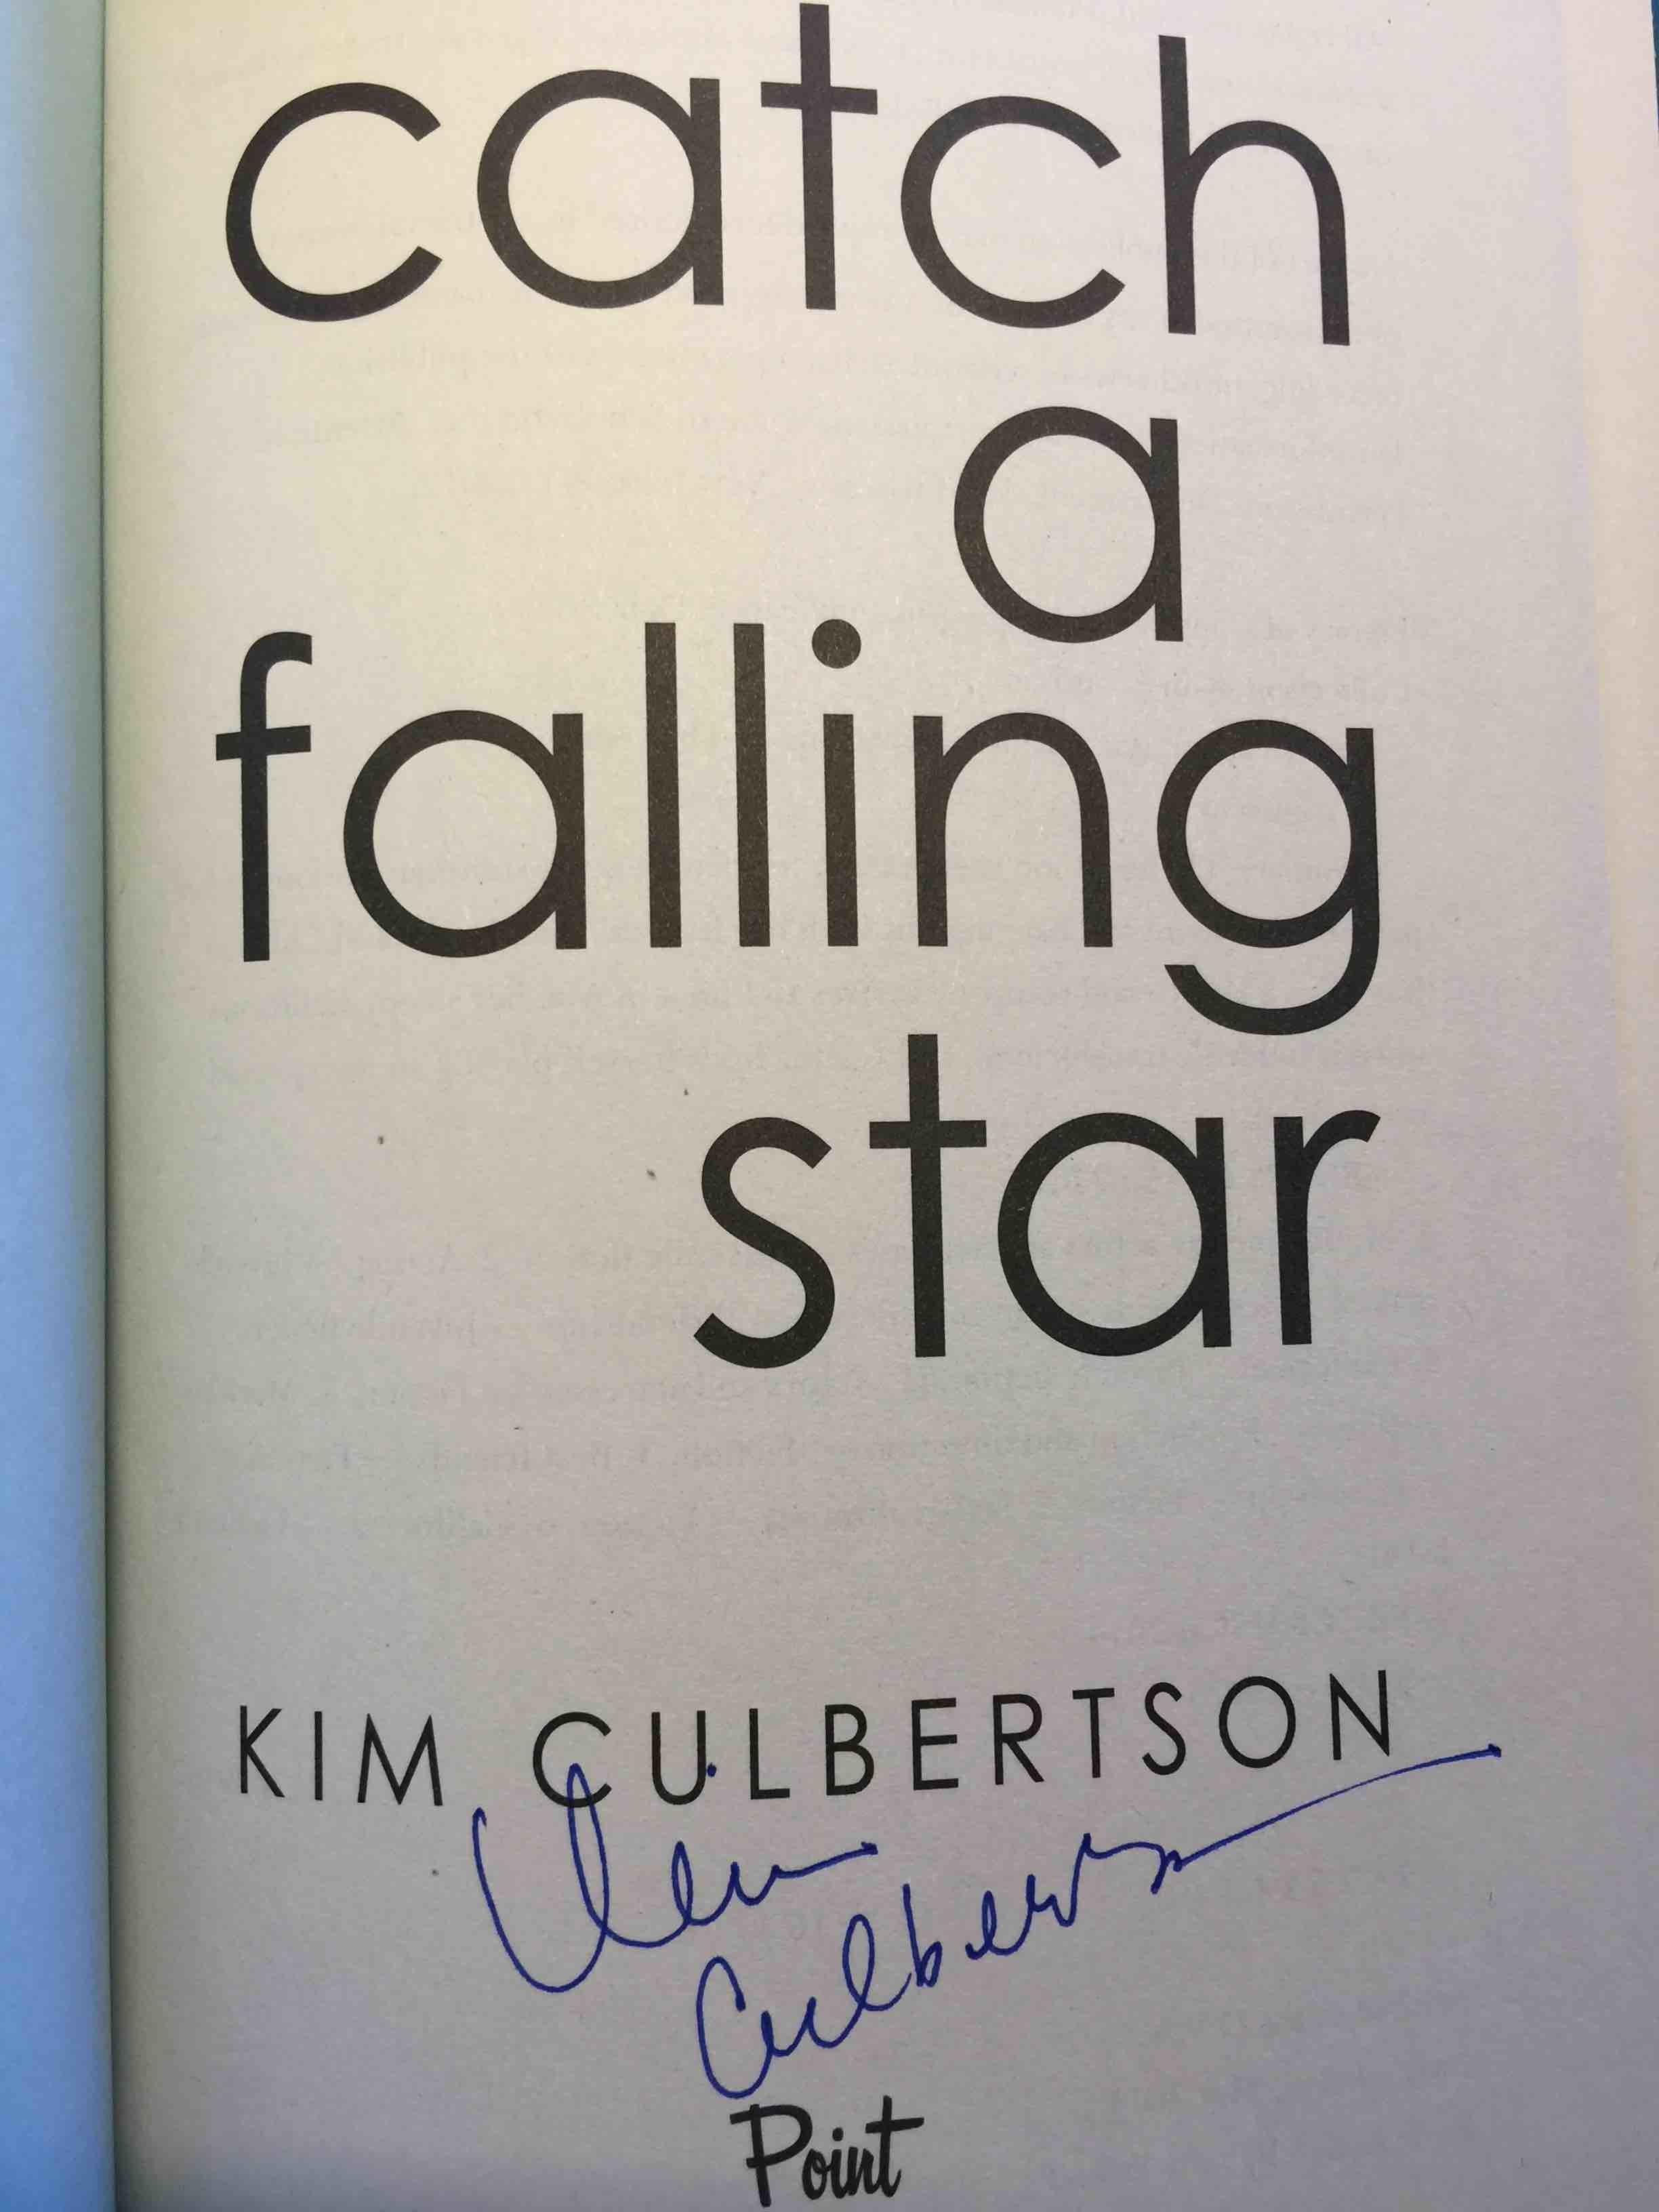 CULBERTSON, KIM. - CATCH A FALLING STAR.